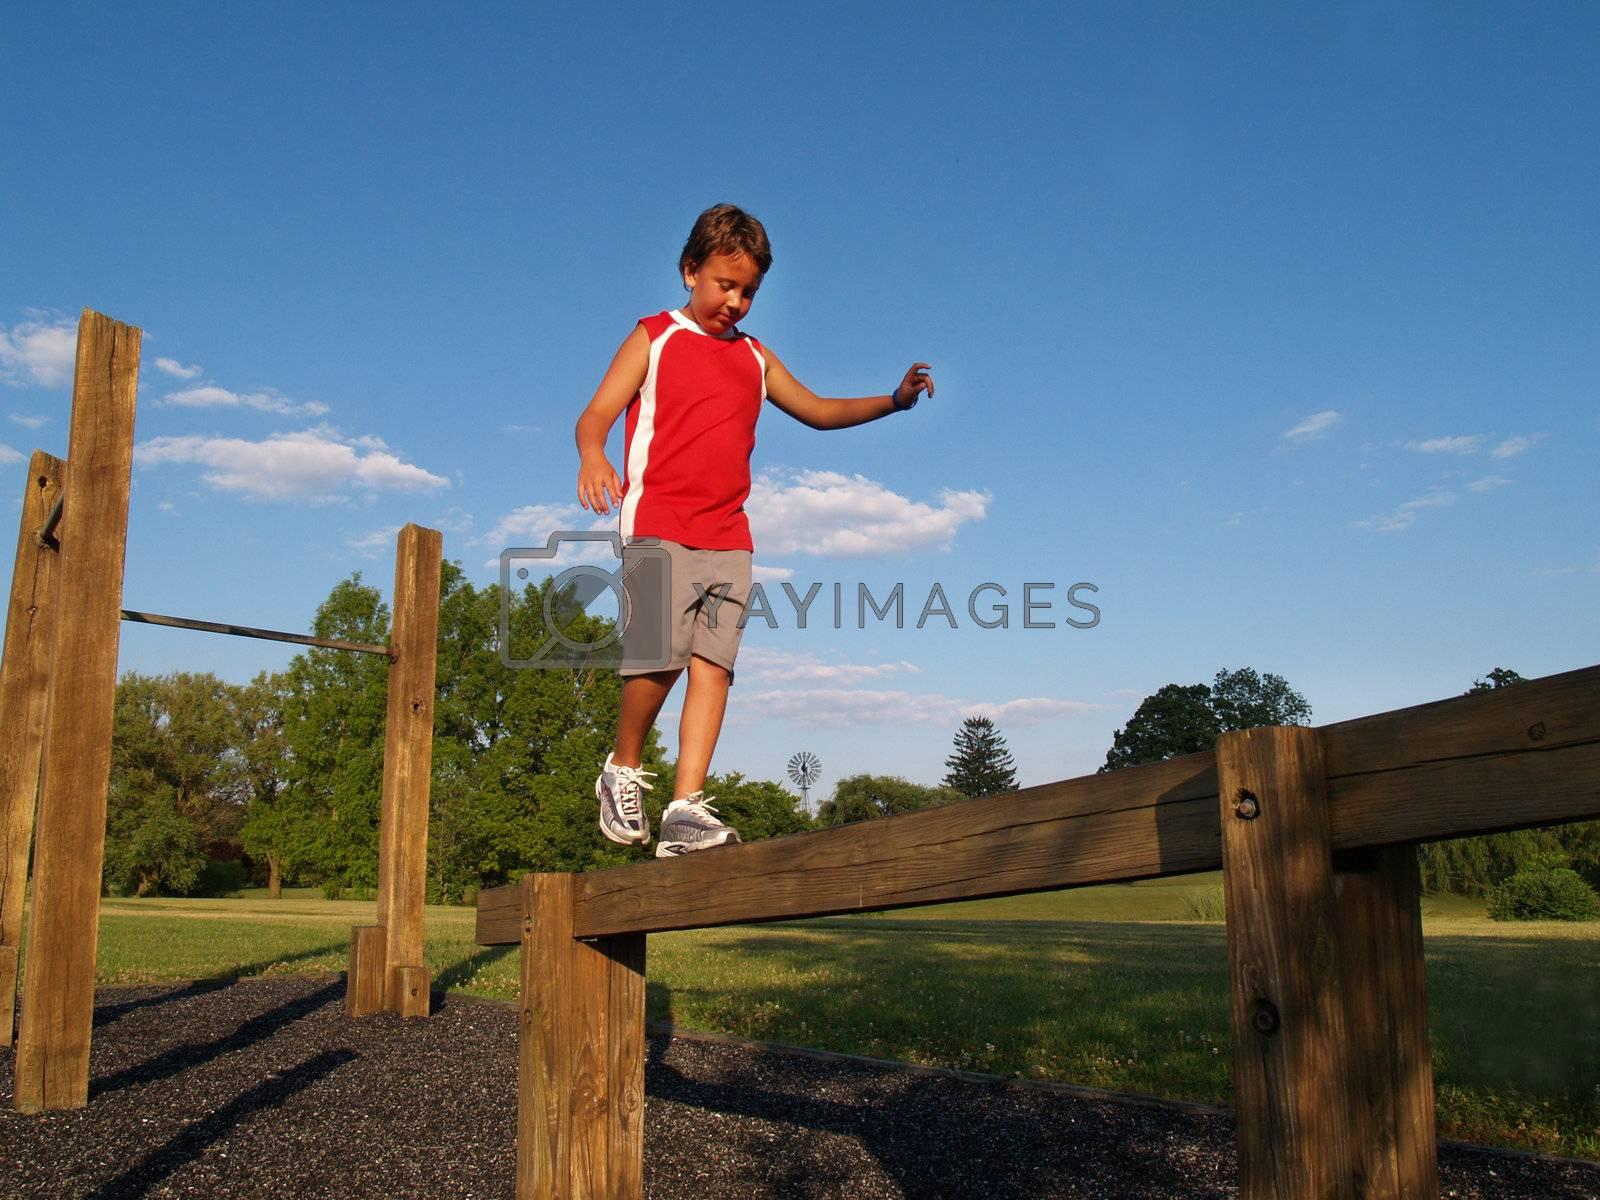 young boy balancing on a balance beam